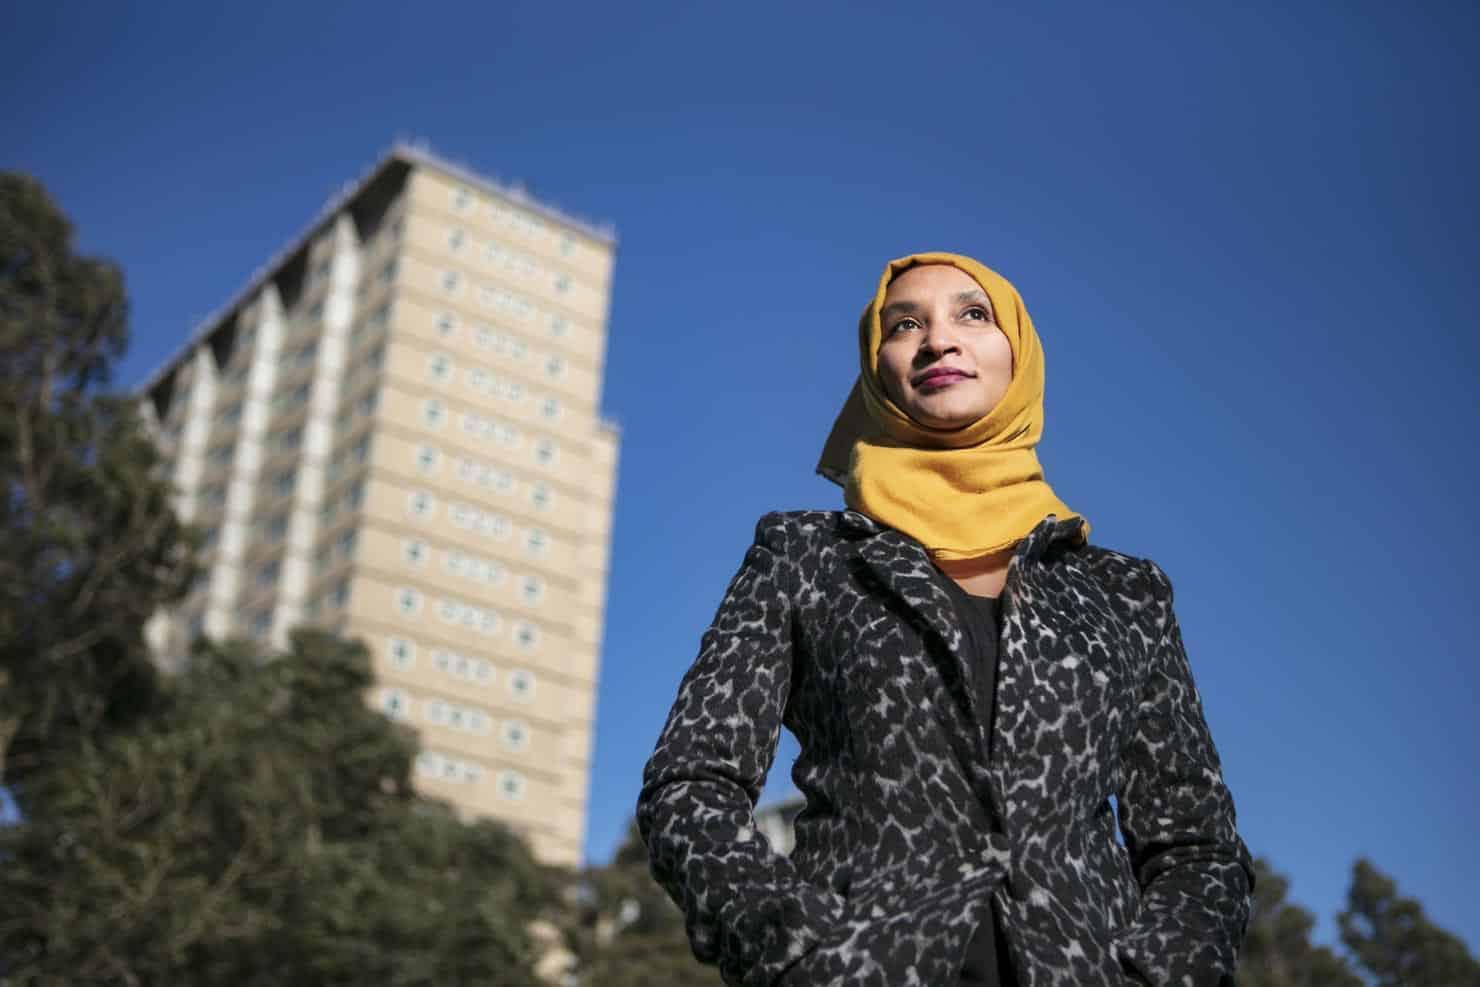 Mulsim woman at housing commission flats